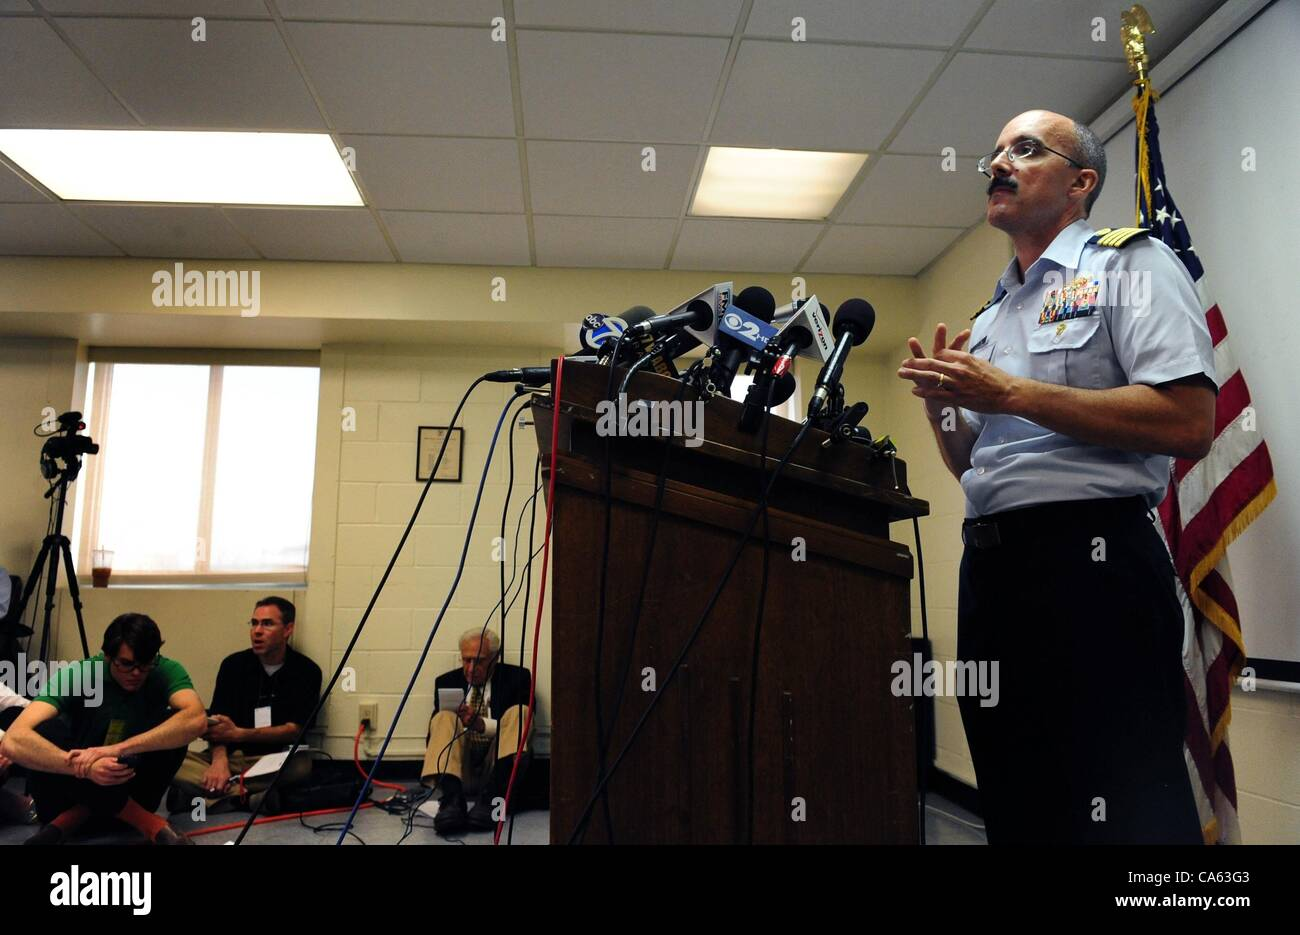 June 12, 2012 - Manhattan, New York, U.S. - Captain GREGORY HITCHEN, Deputy Commander of Coast Guard Sector New Stock Photo